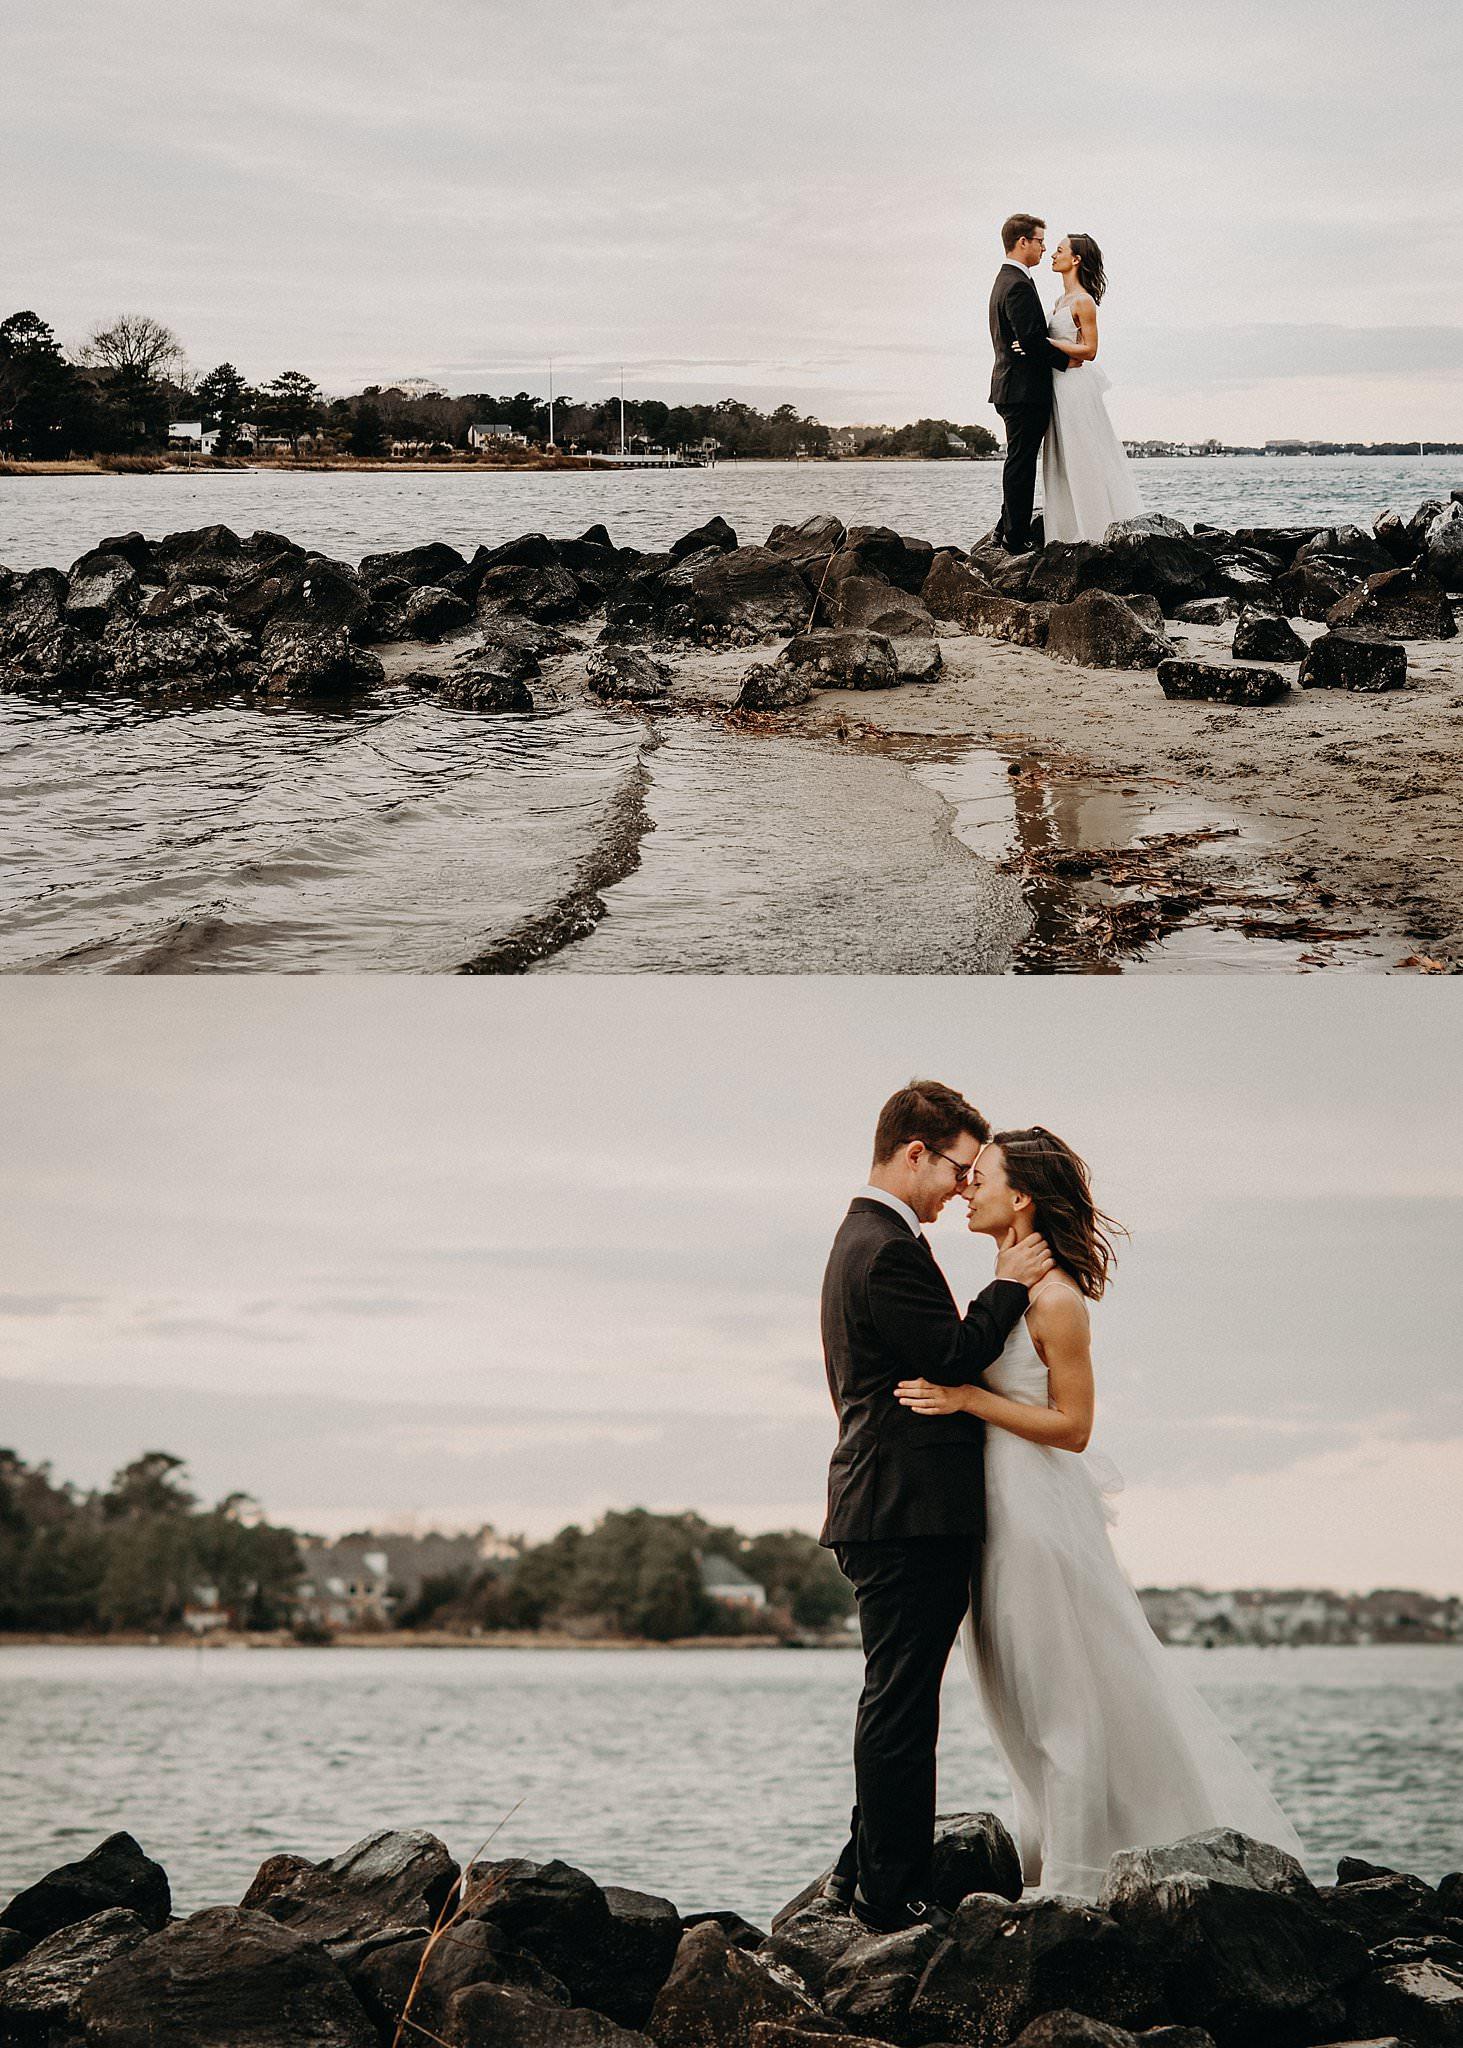 creative-wedding-photography-by-VA-award-winning-wedding-photographer-melissa-bliss-photography.jpg